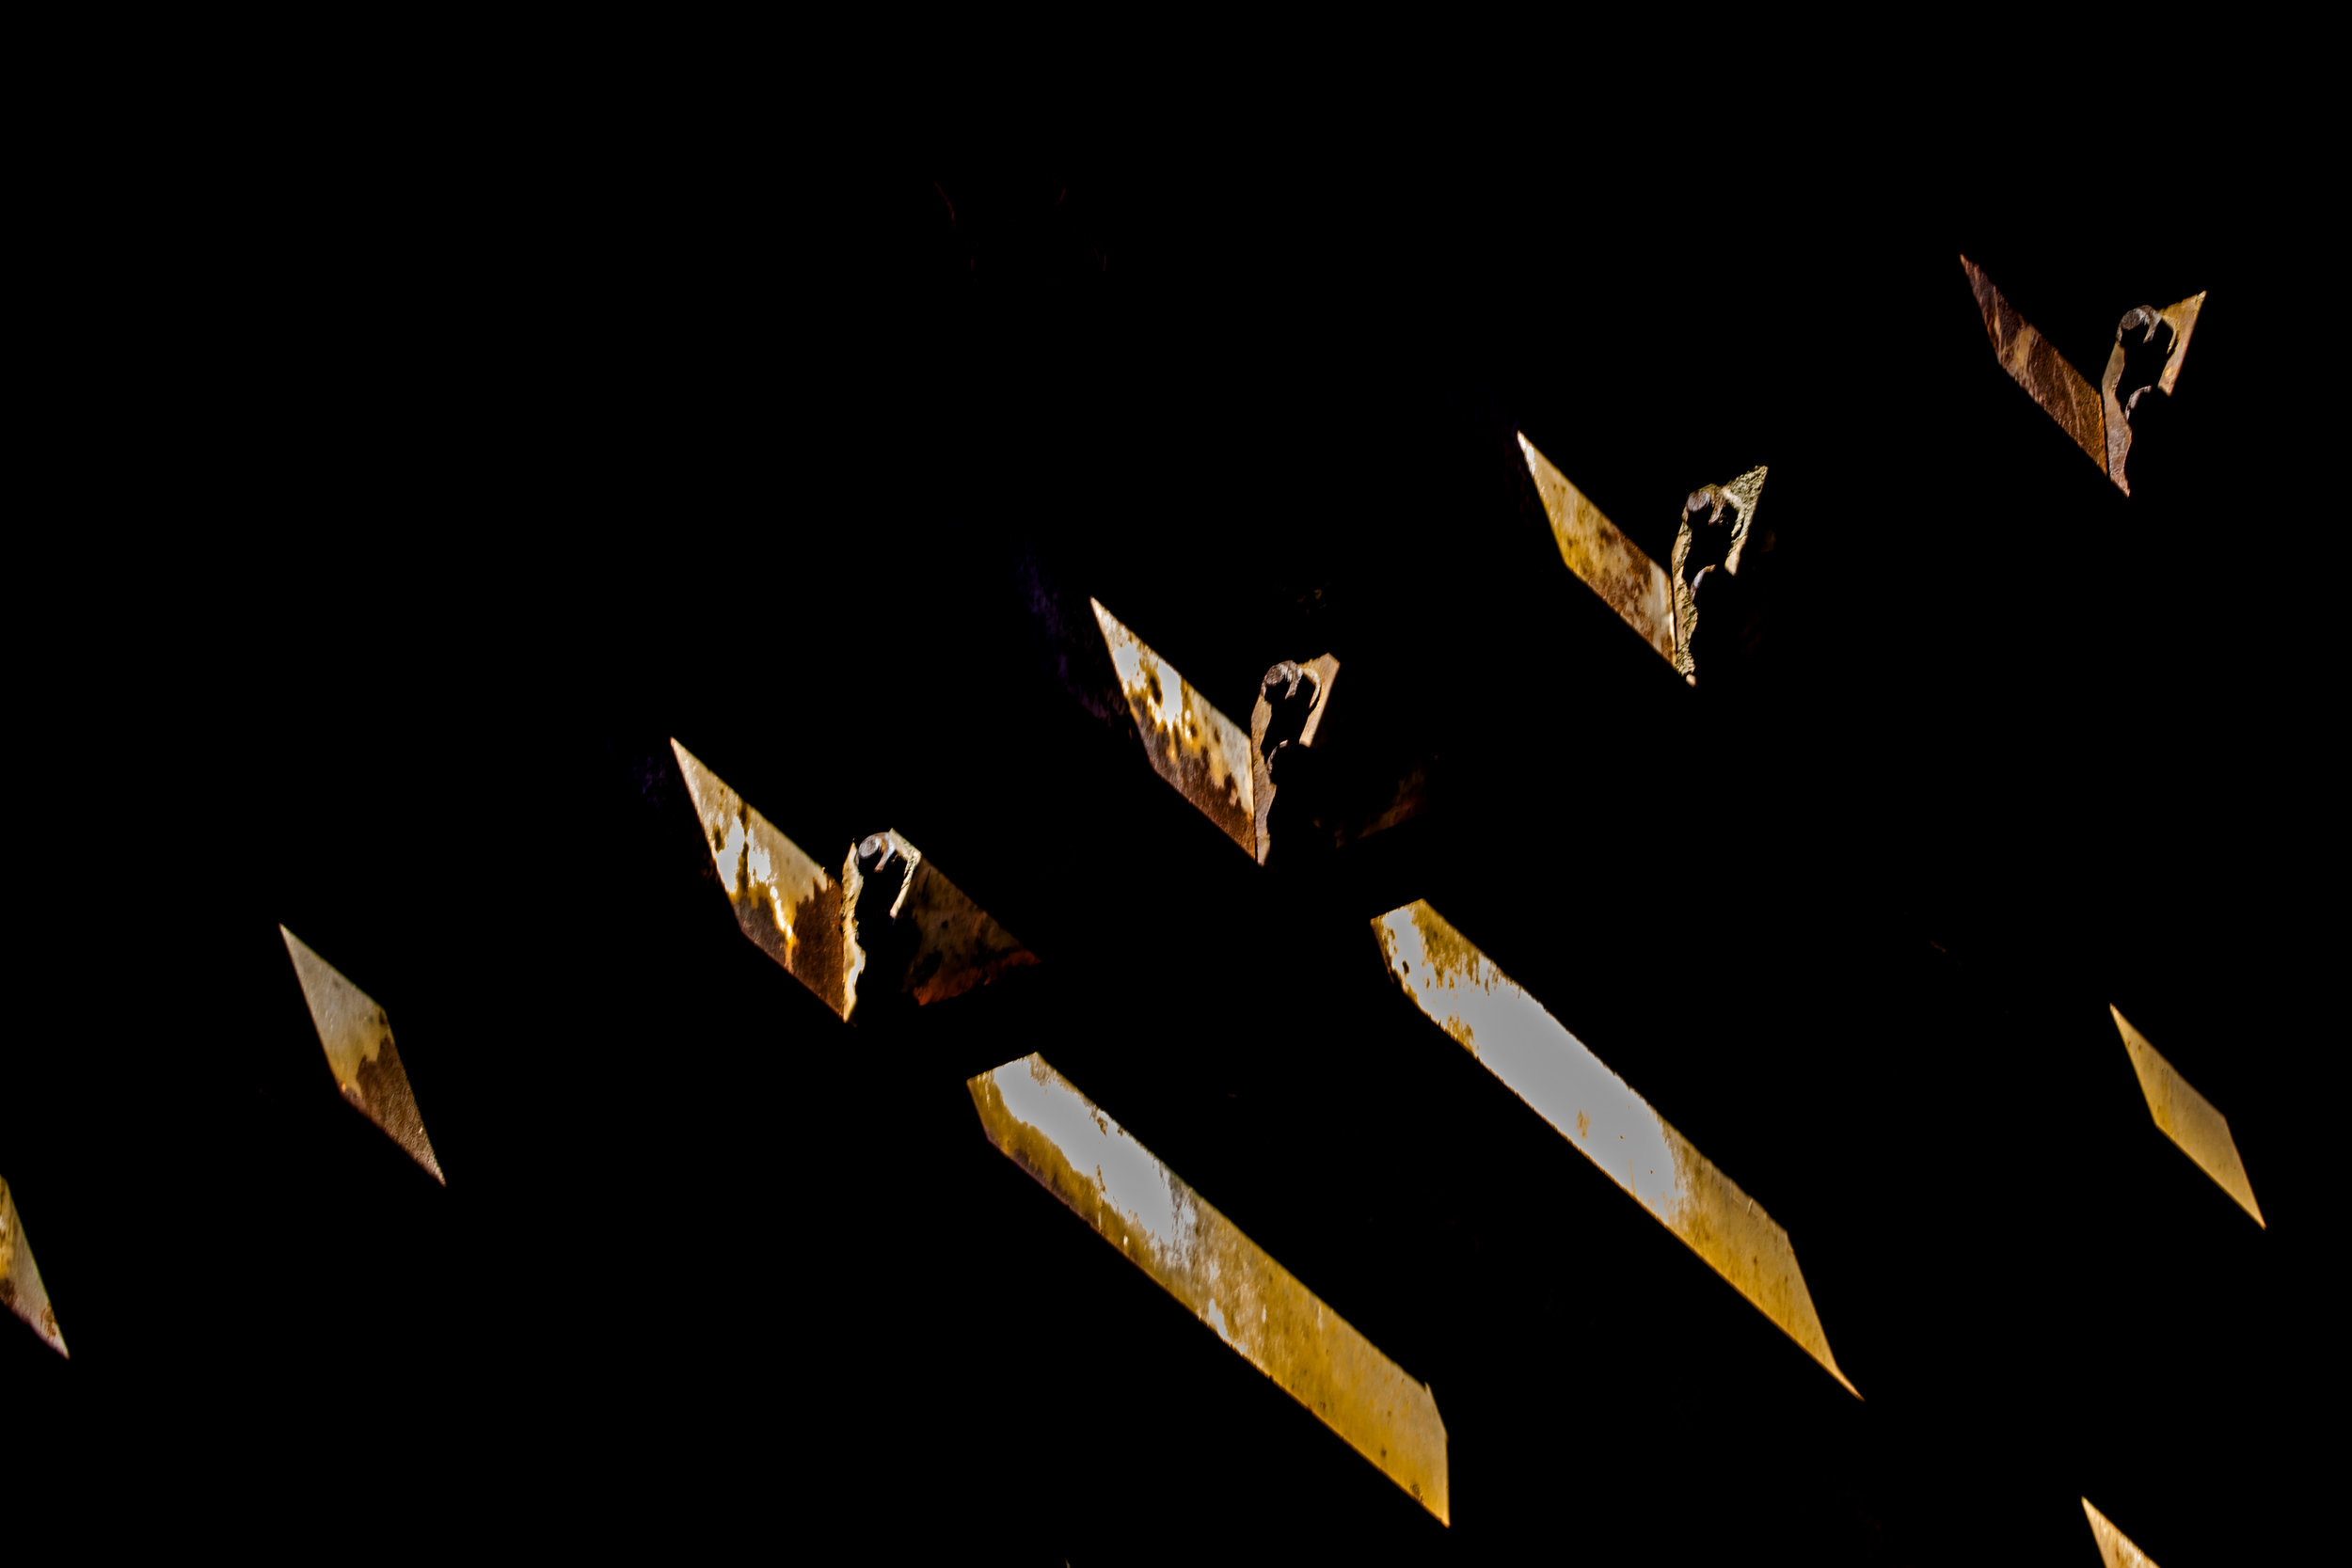 5I8A3534 copy-1 cropped X.jpg